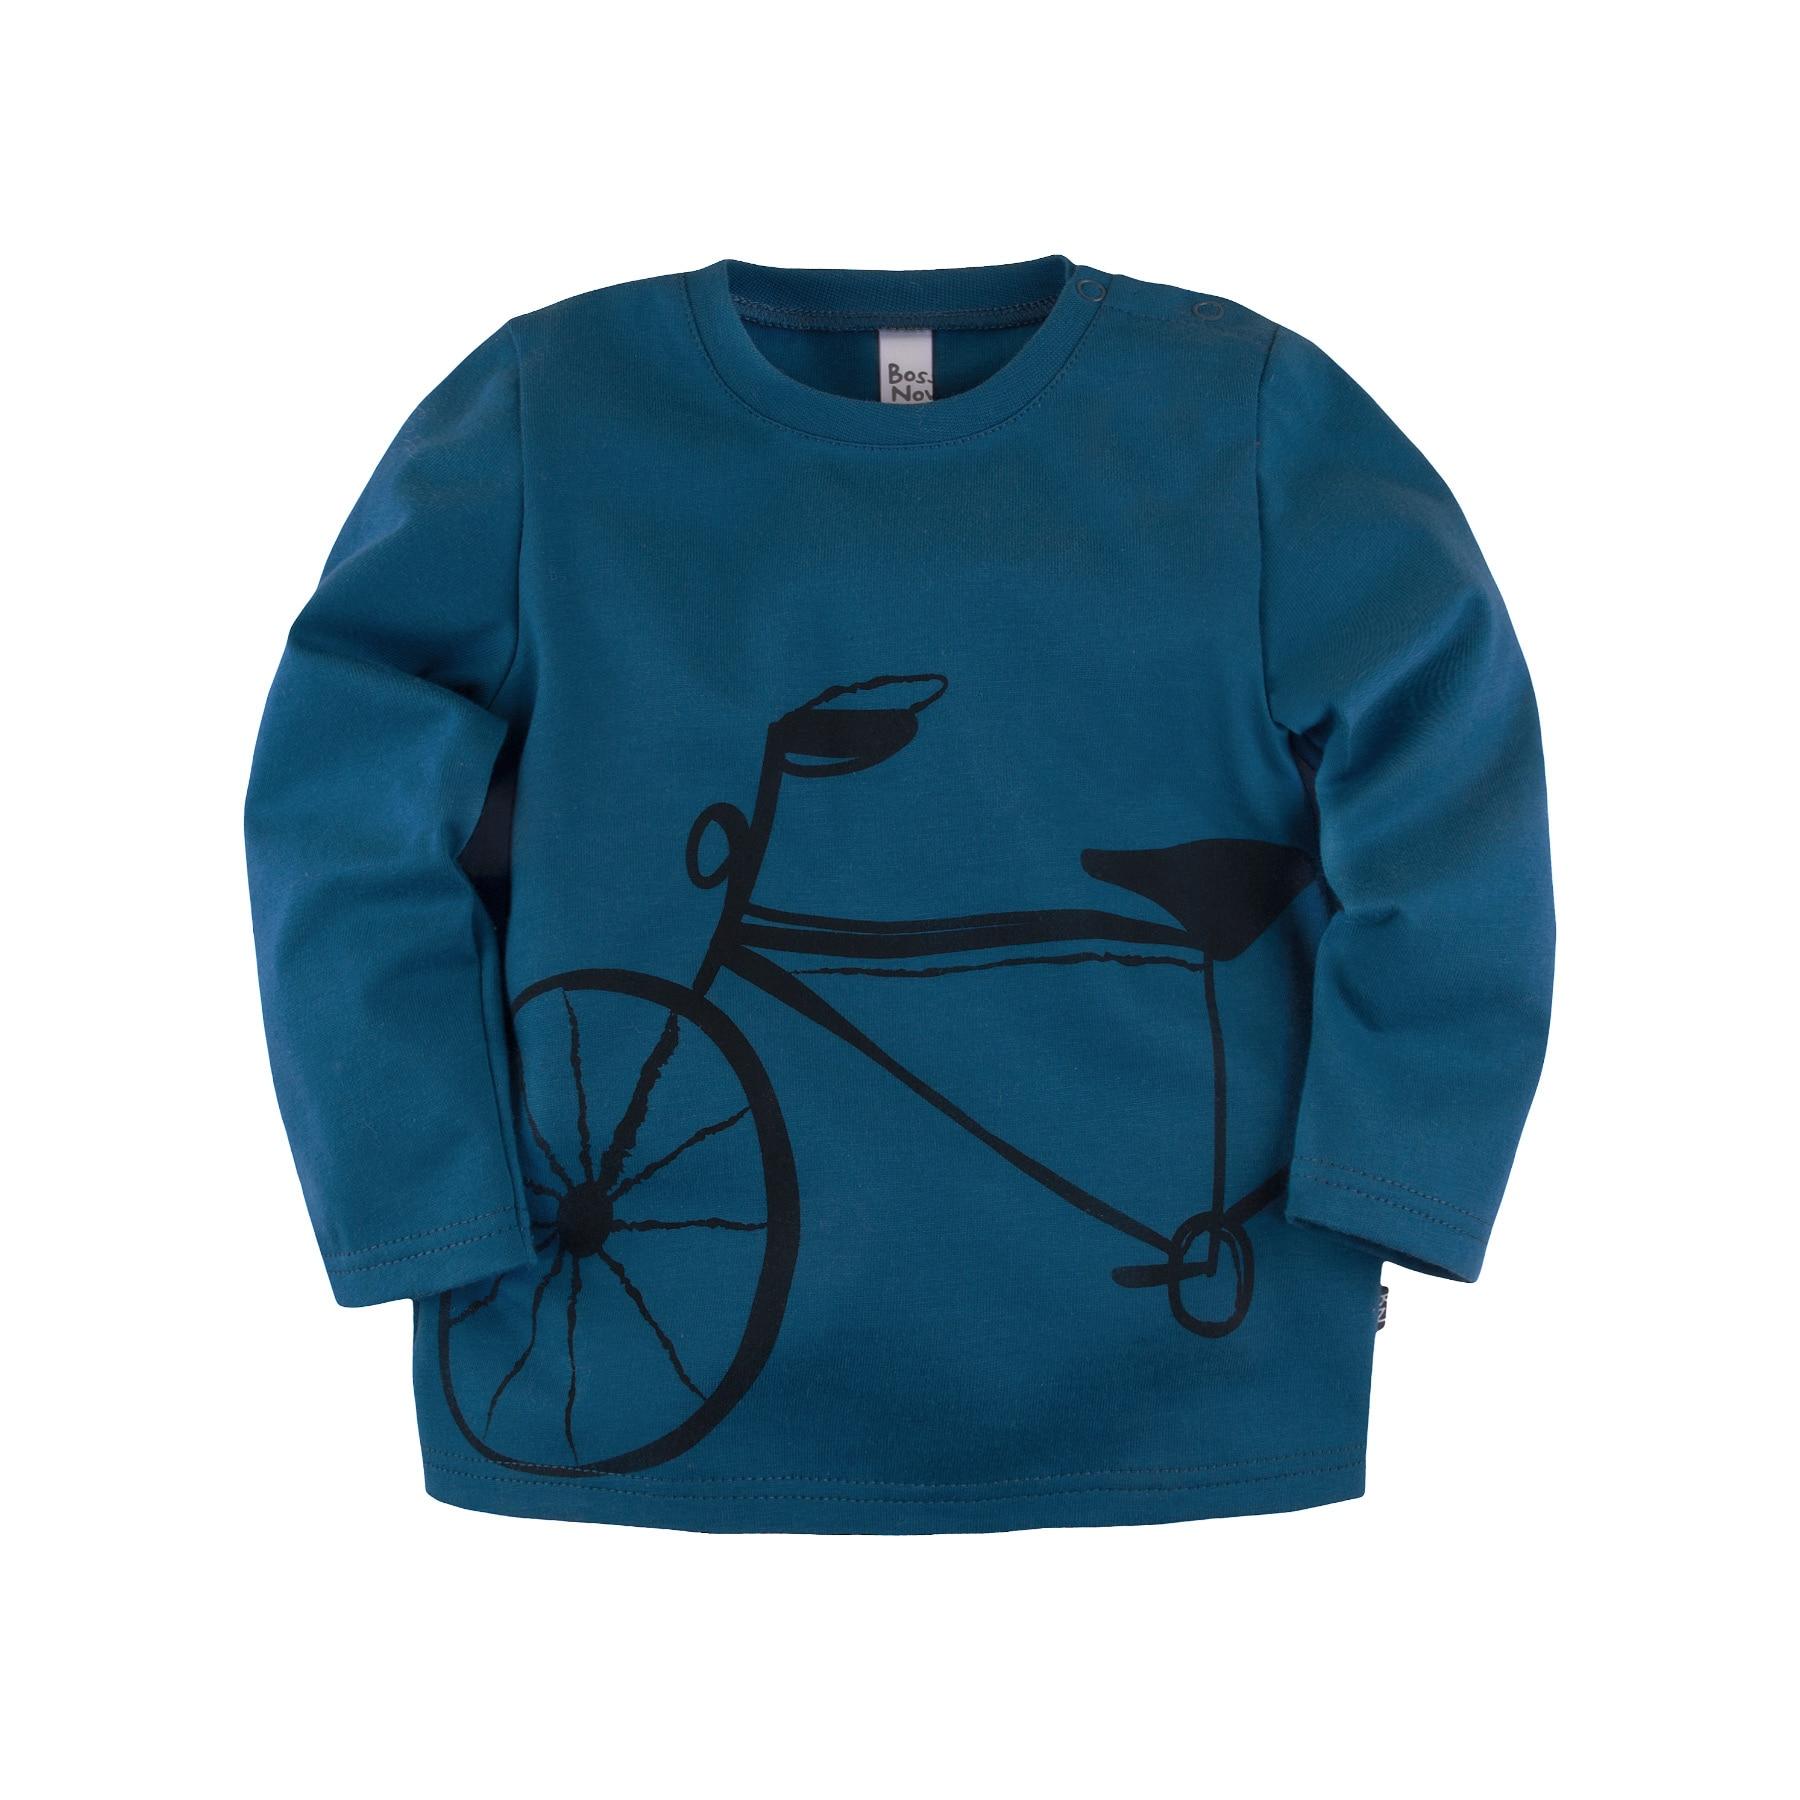 Sweatshirt for boy BOSSA NOVA 557B-161с sweatshirt ruck